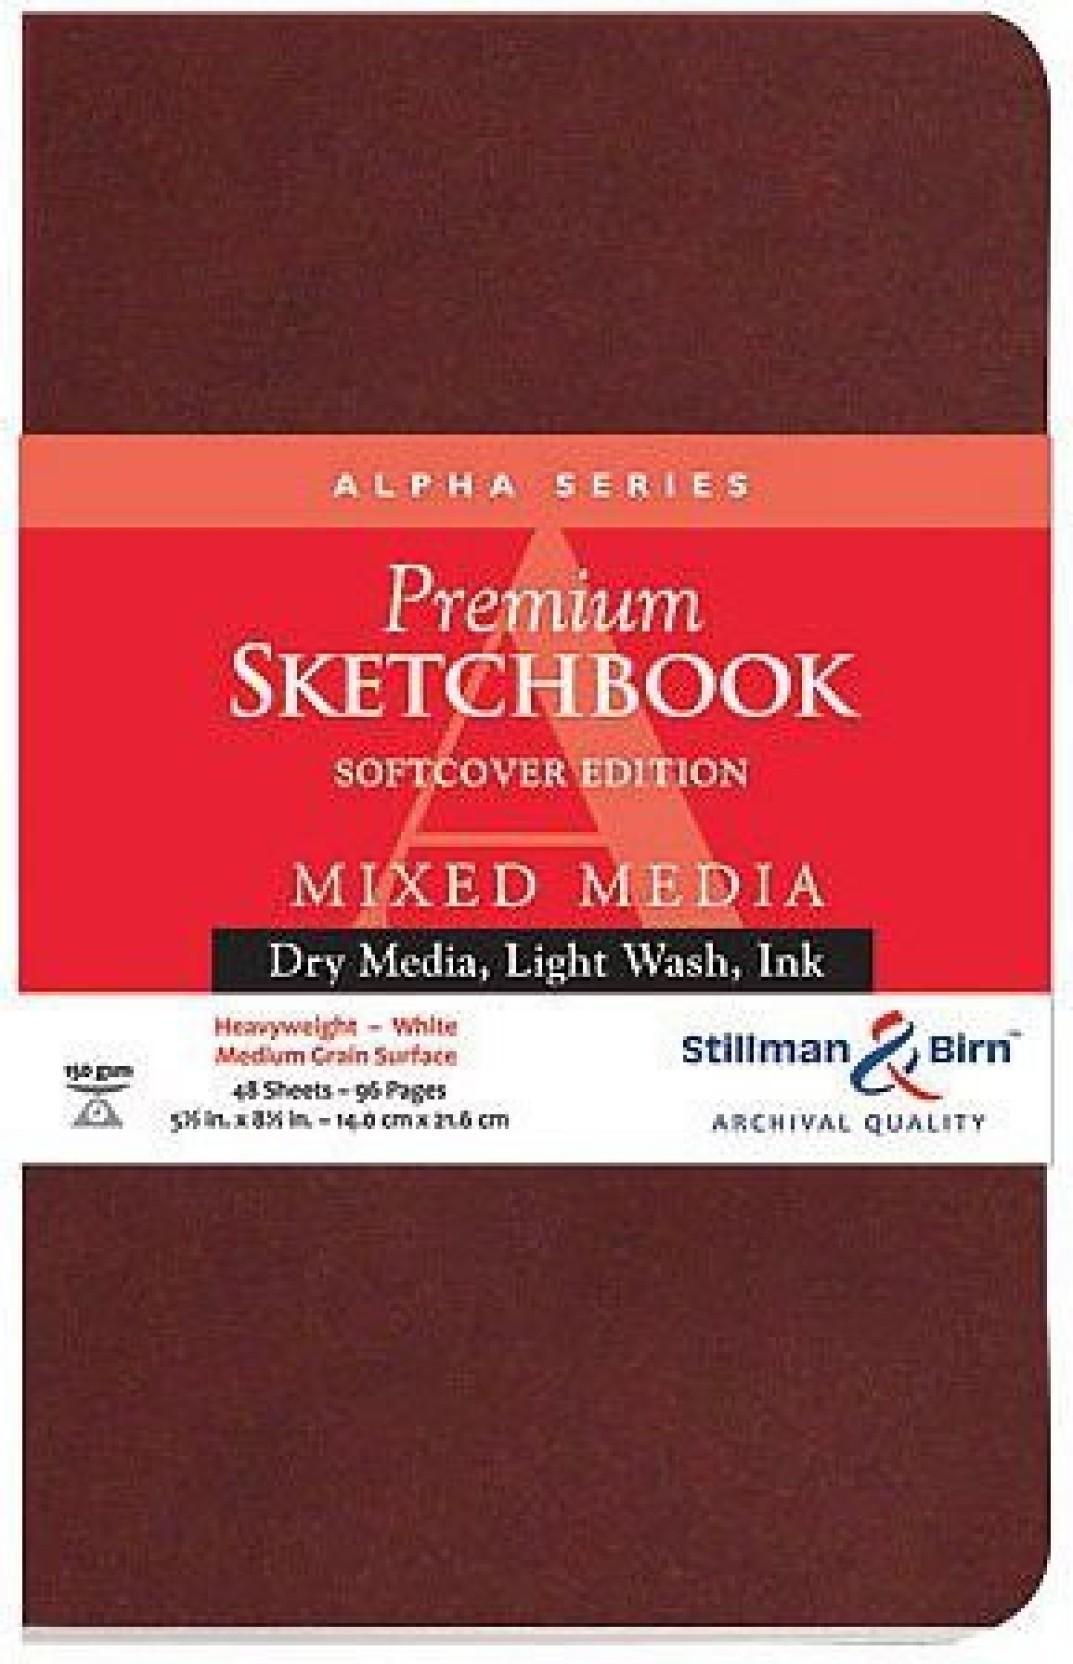 28 Sheets, White Stillman  Birn Zeta Softcover Sketchbook Heavyweight 180lb